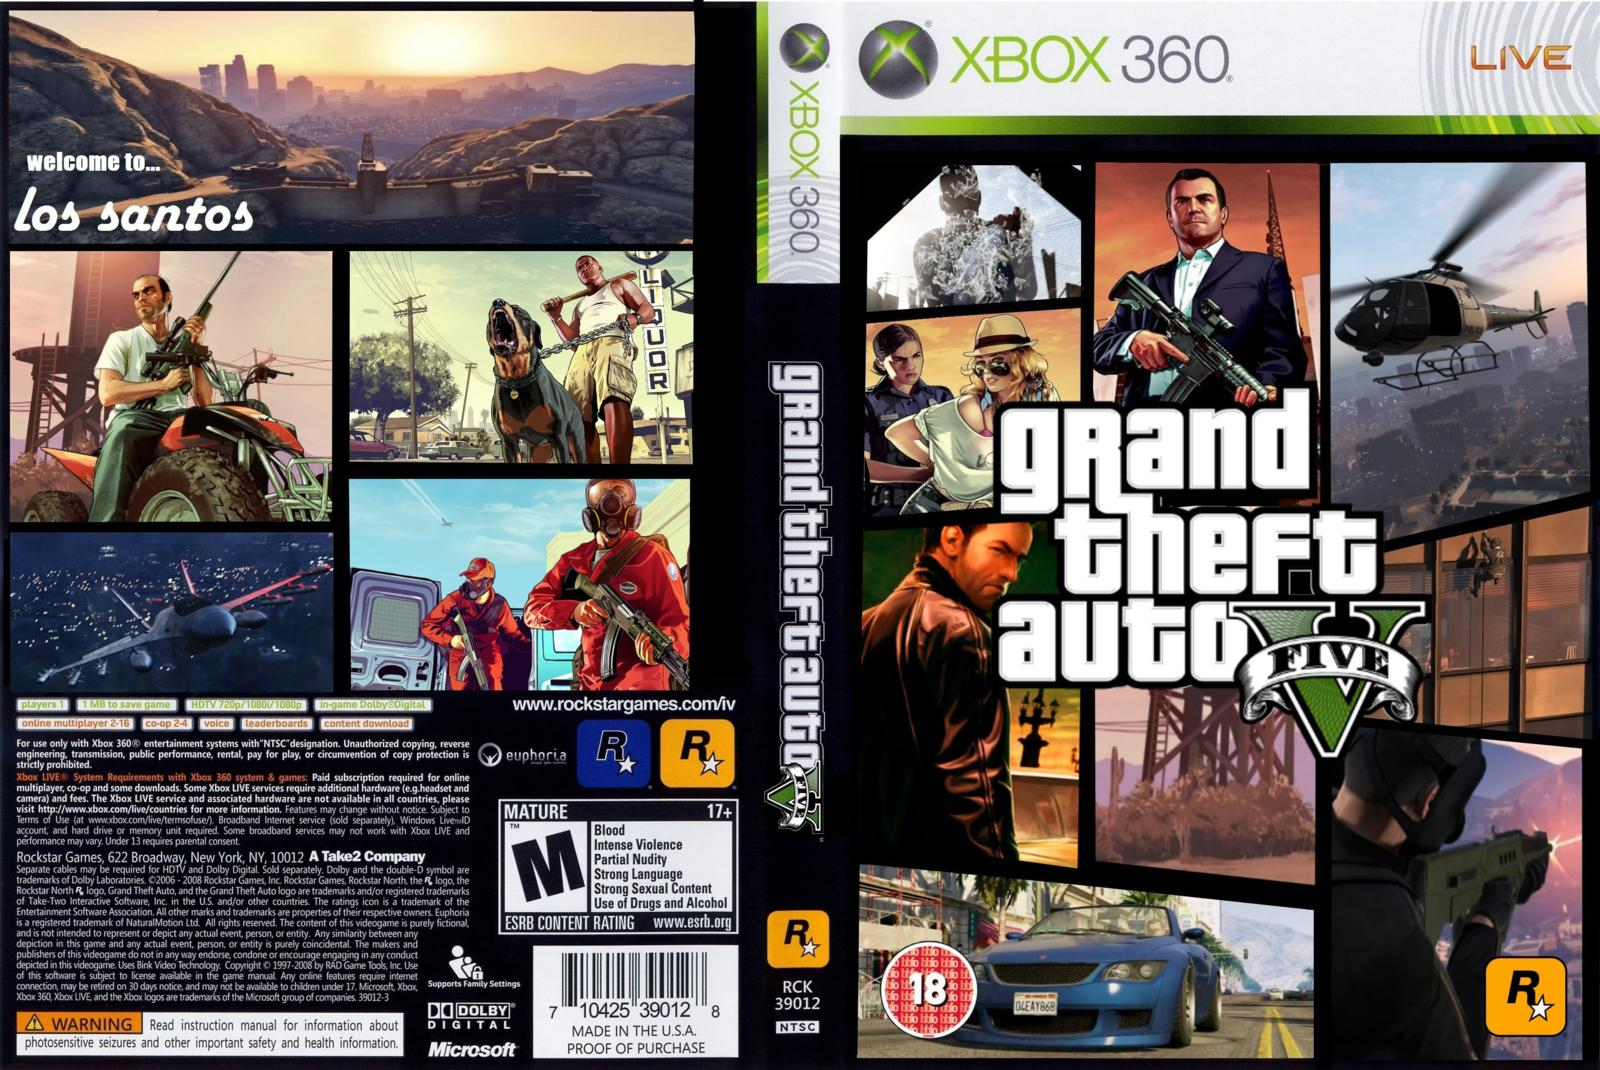 Gta 6 Cover: Grand Theft Auto 5 Cover Art Follows The Series